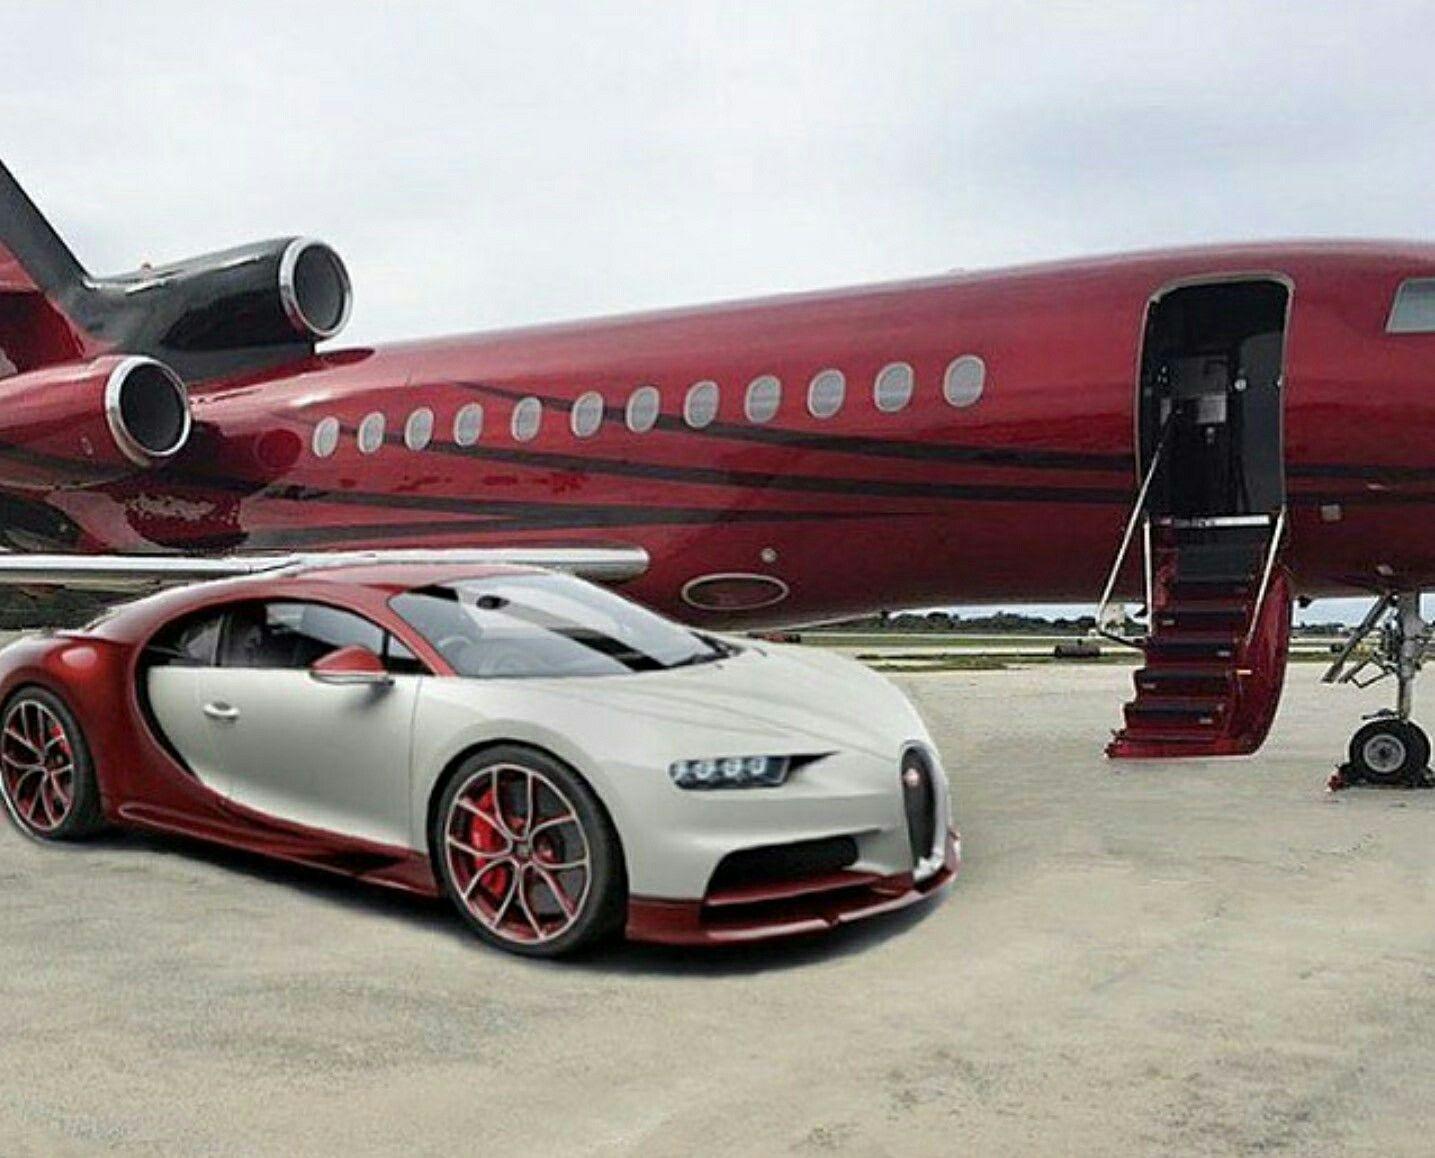 Bugatti Chiron Private Jet Lewis Hamilton Teath LH44  Aviation  By Mel